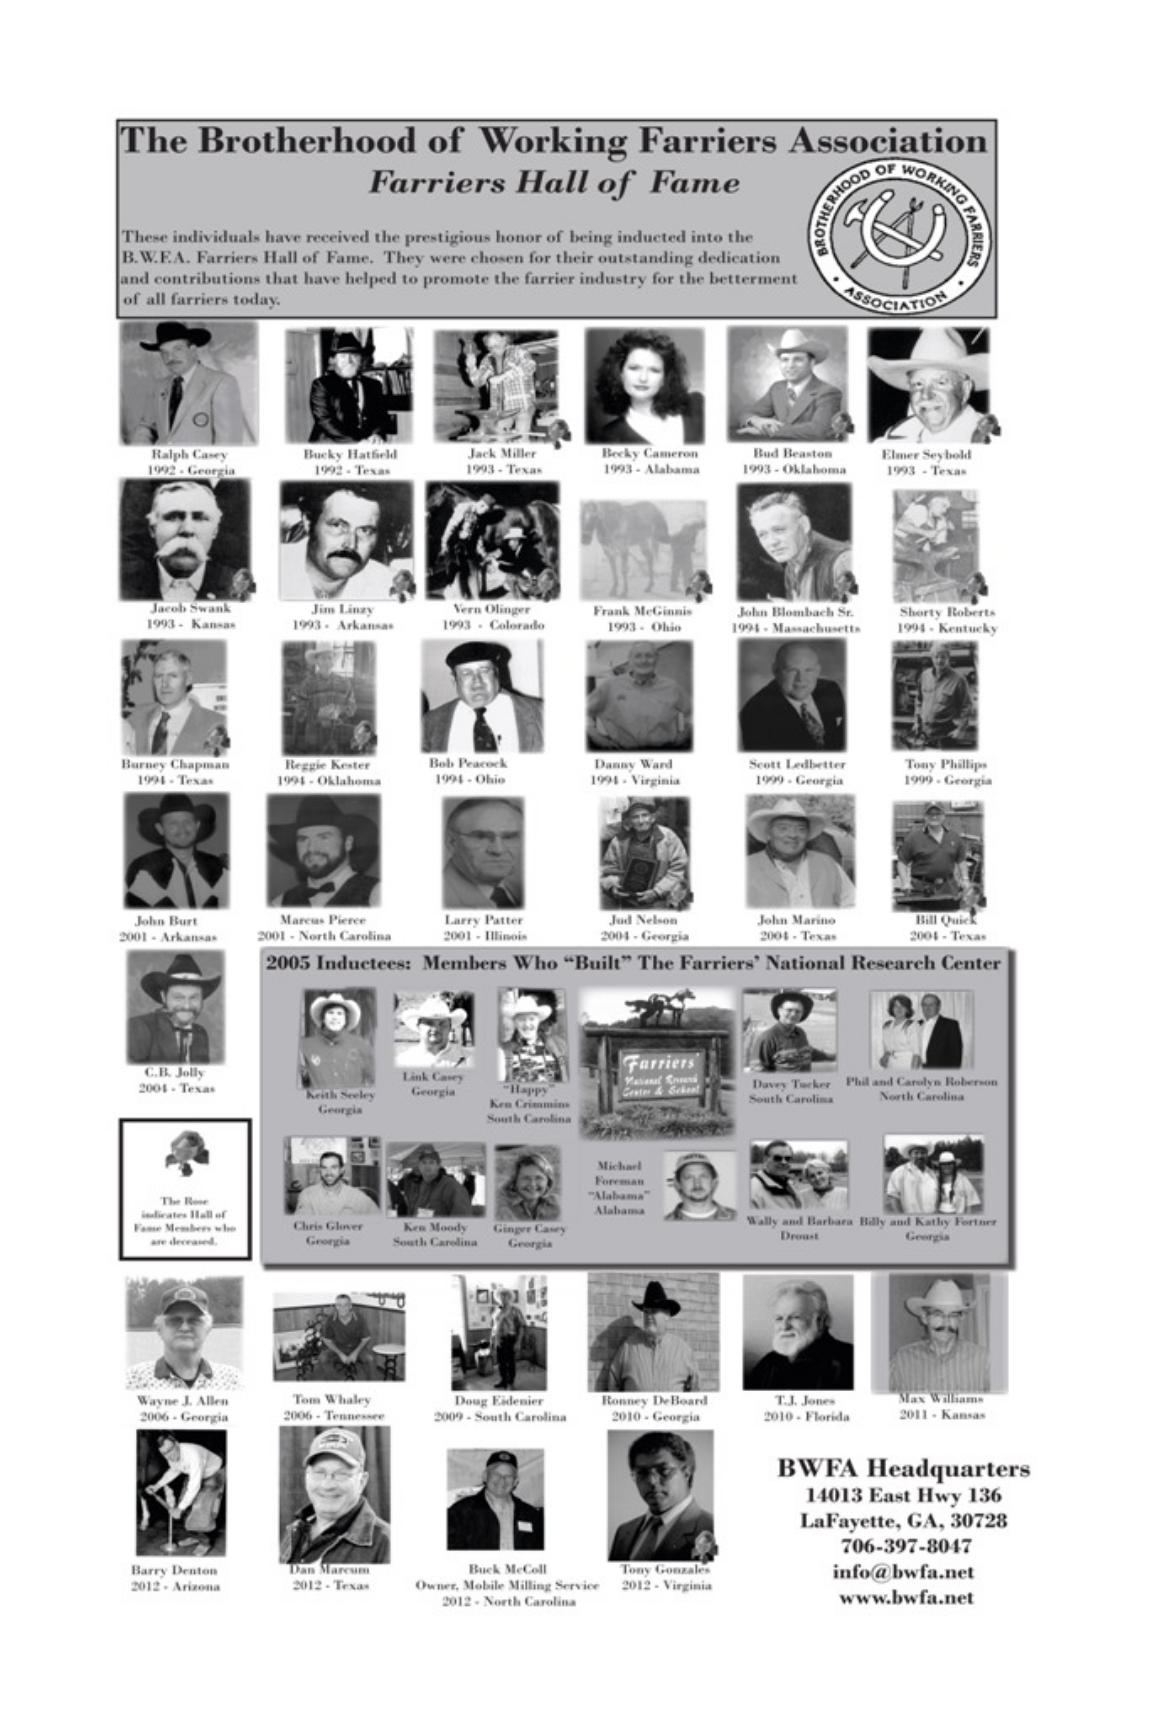 Hall of Fame poster 10-9-12  1024x768 .jpg